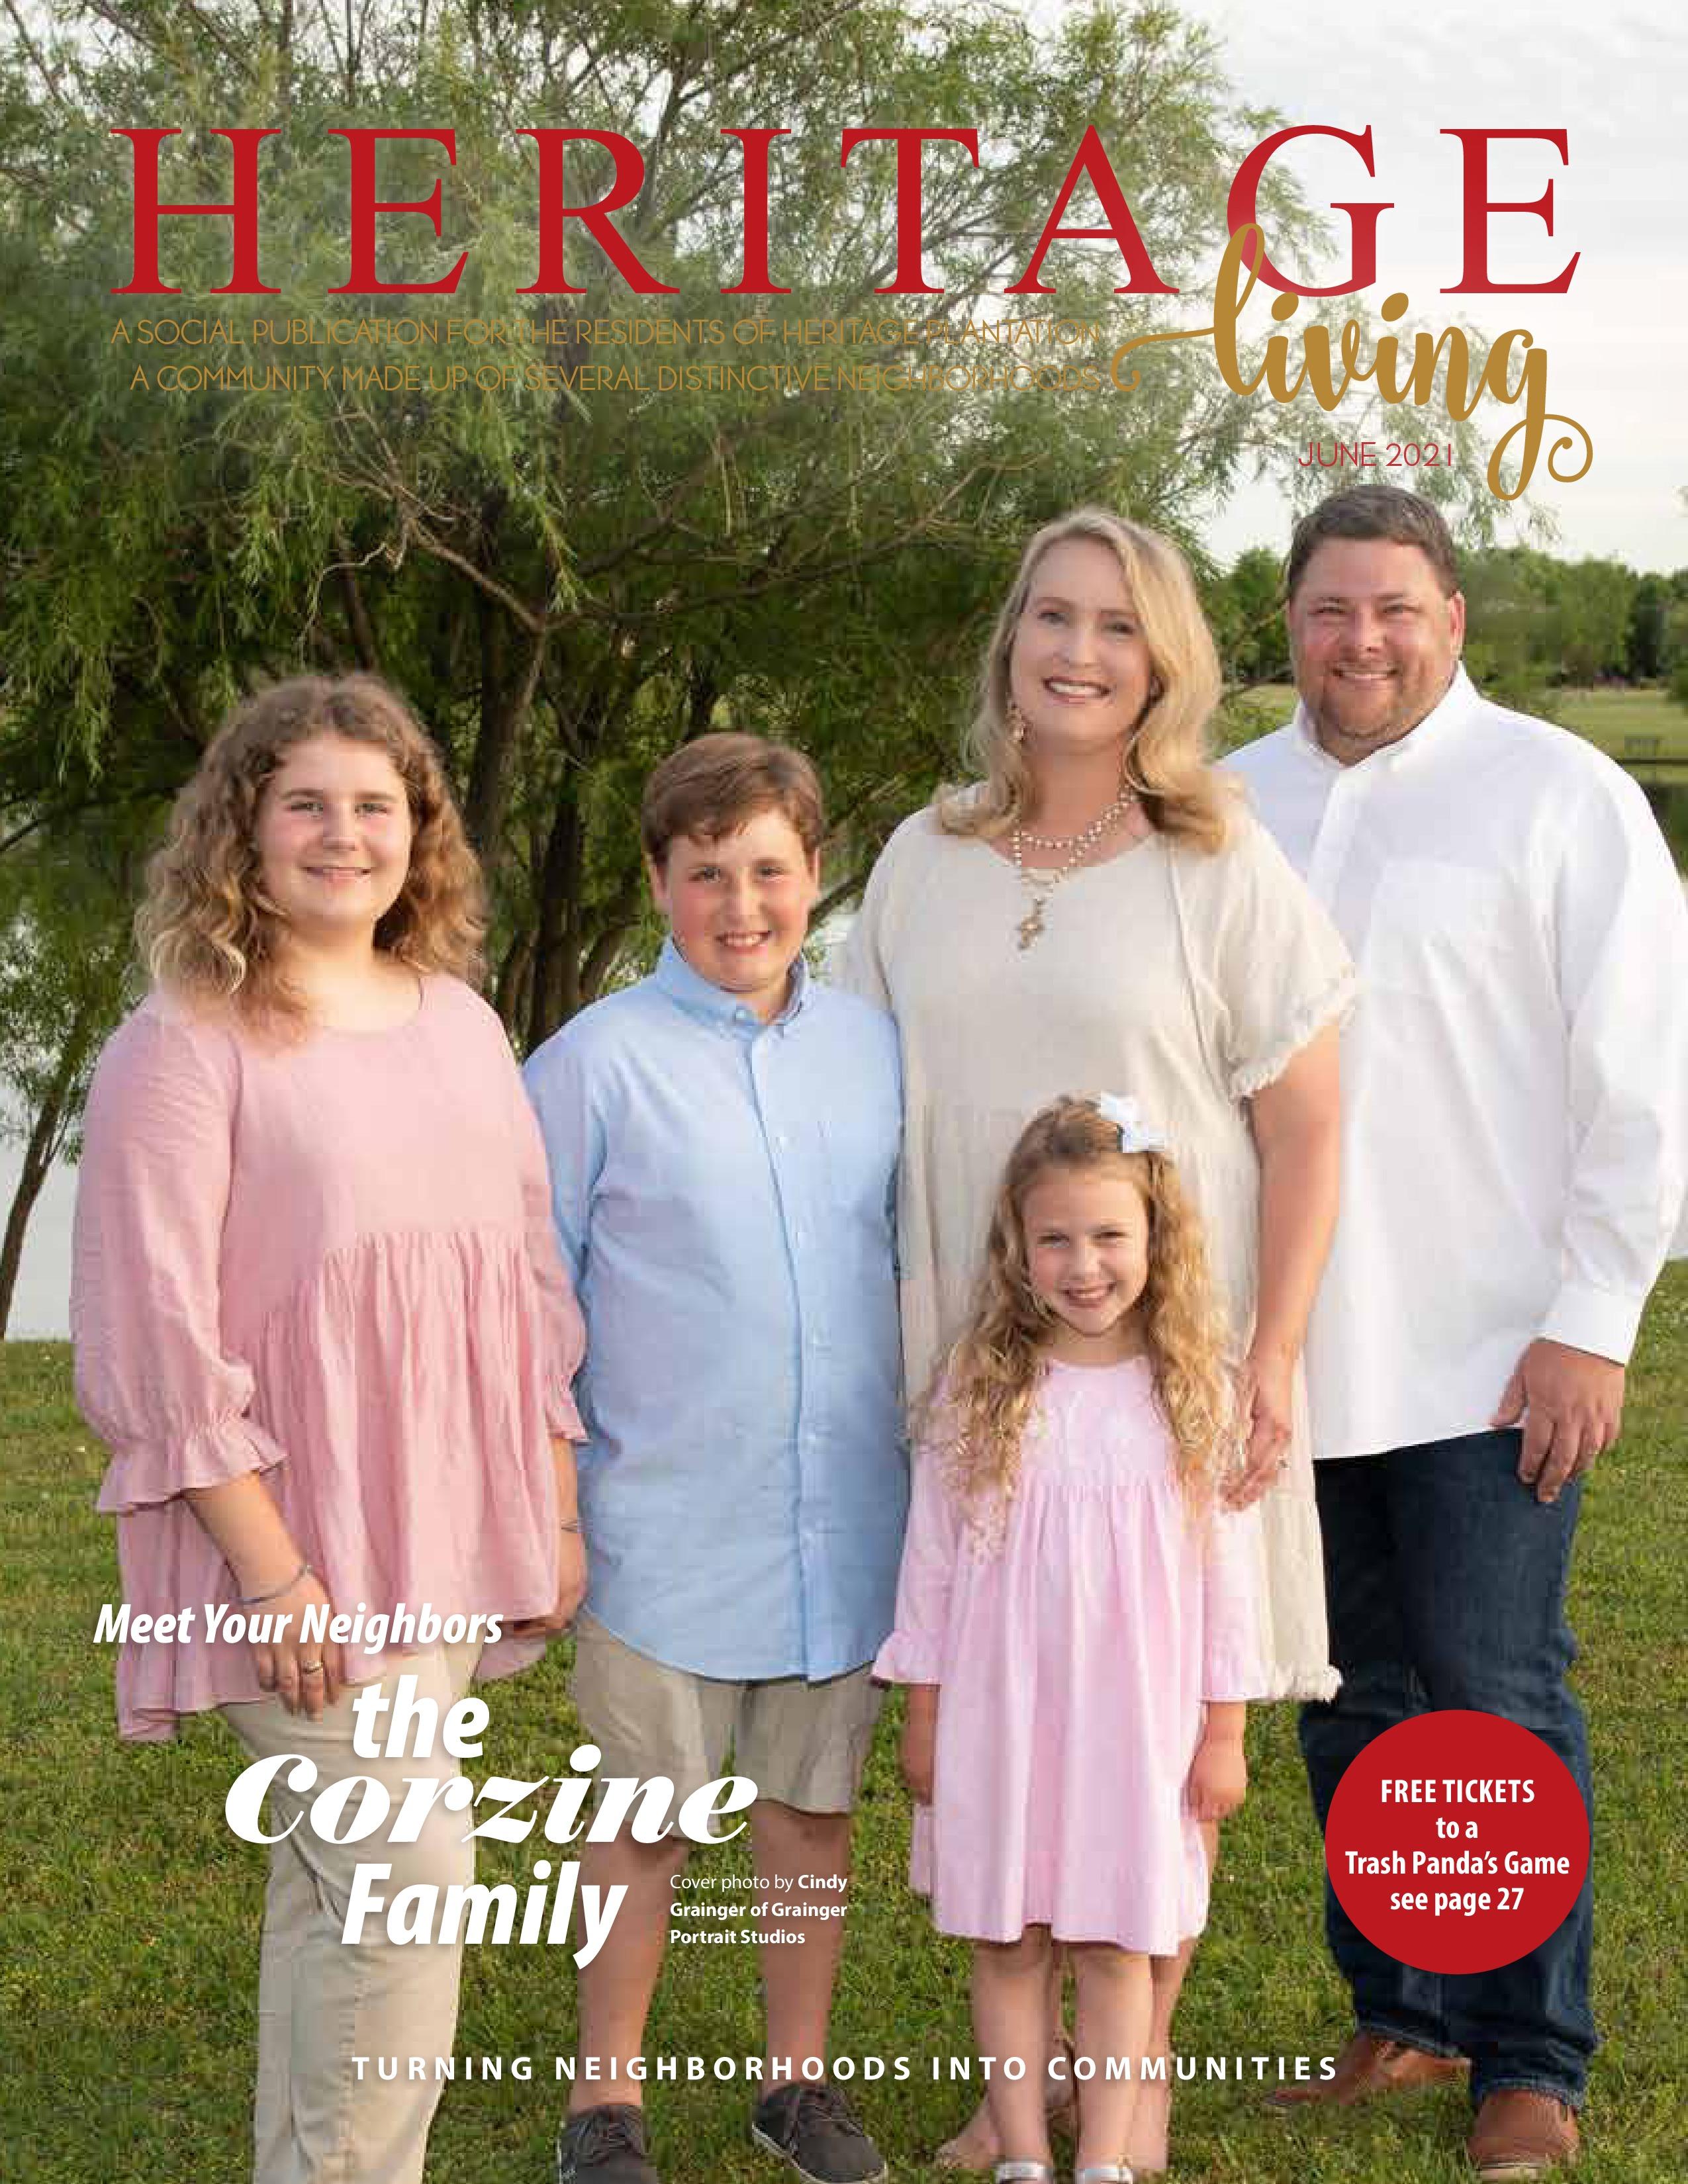 Heritage Living 2021-06-01